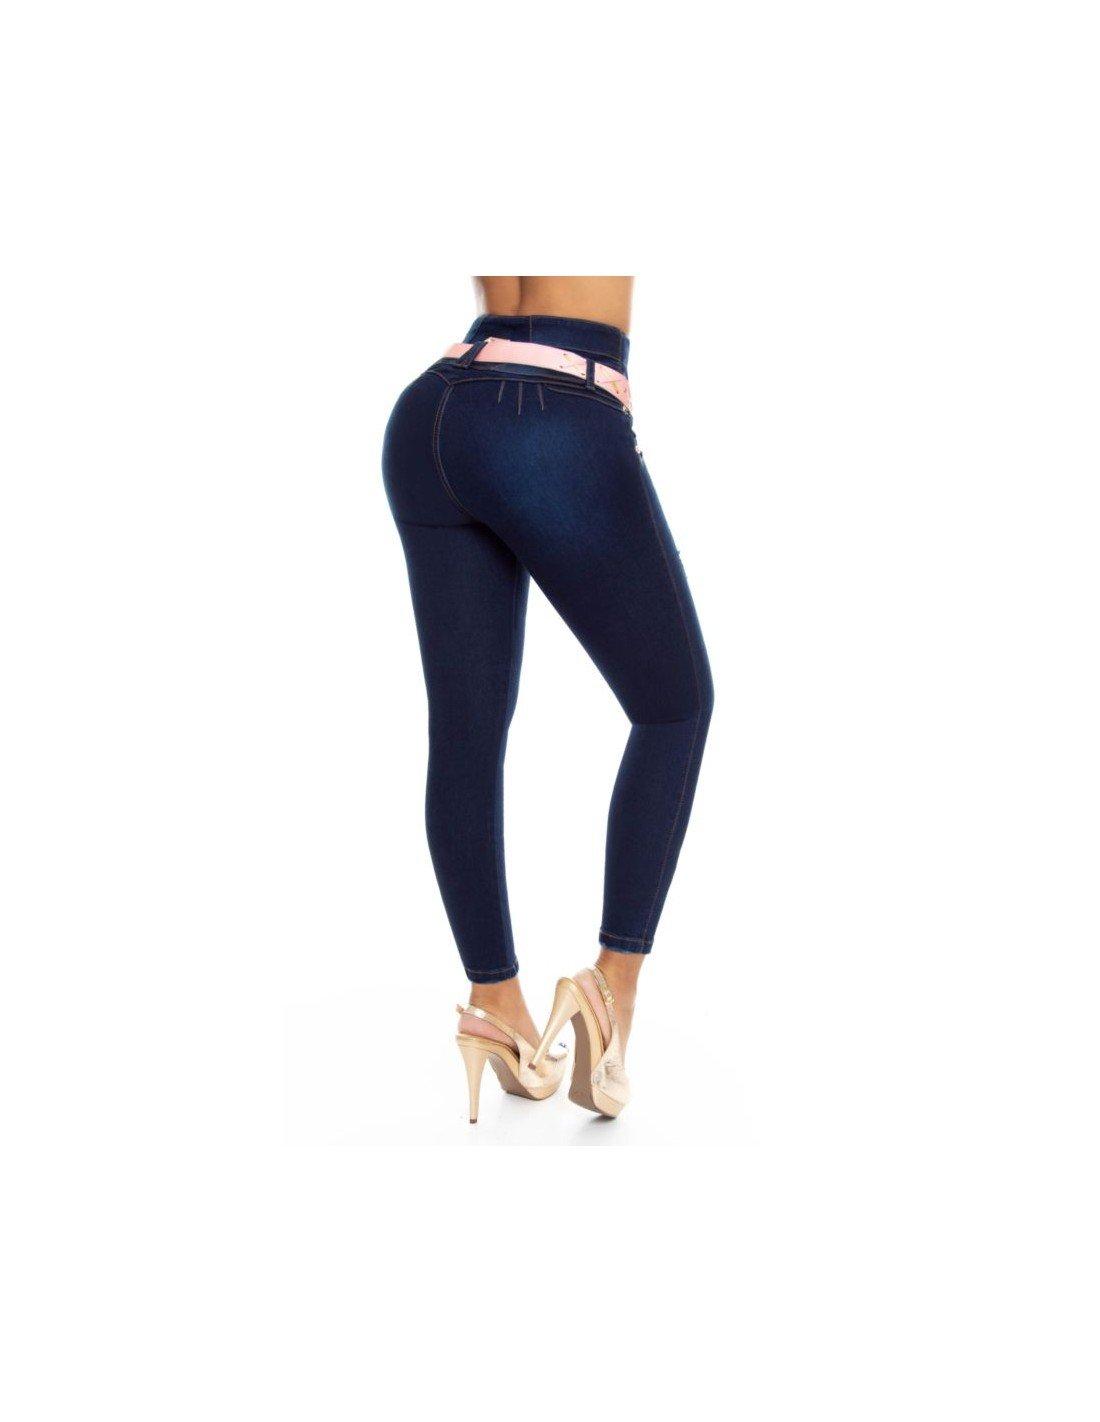 Pantalon Colombiano PL6697